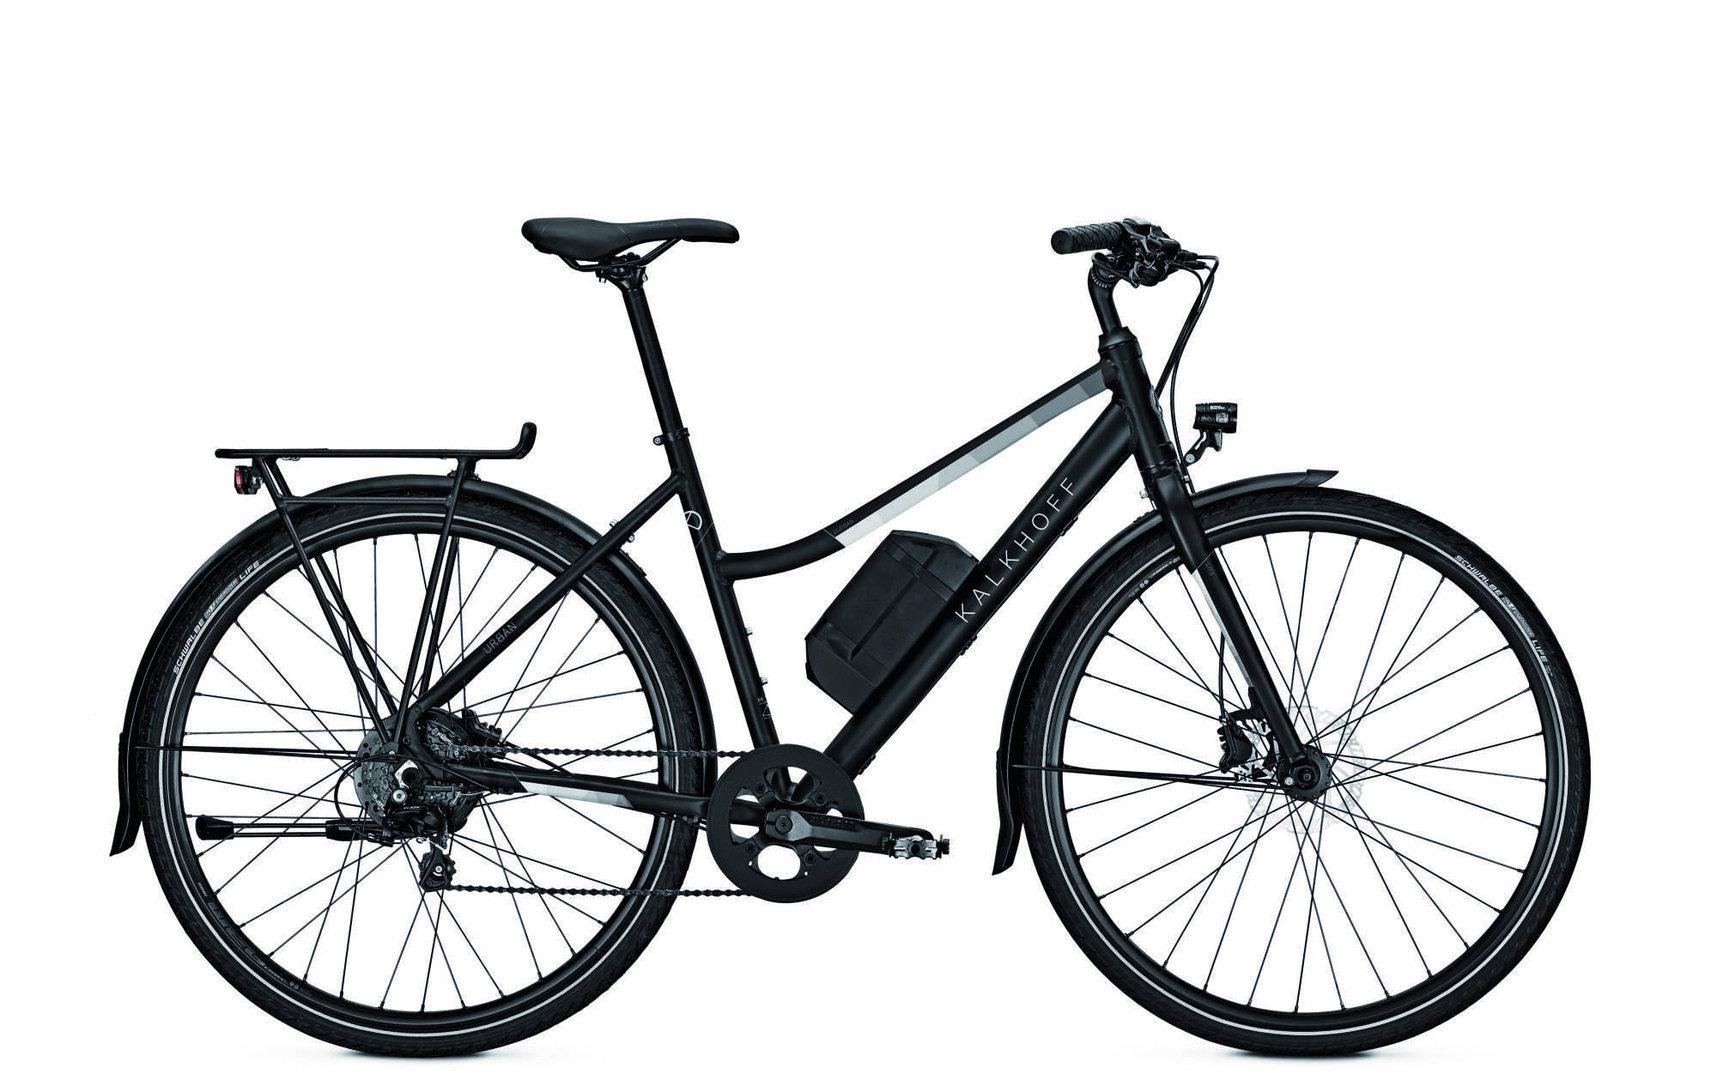 kalkhoff durban g8 elektro fahrrad urban ebike 2017 online neu. Black Bedroom Furniture Sets. Home Design Ideas